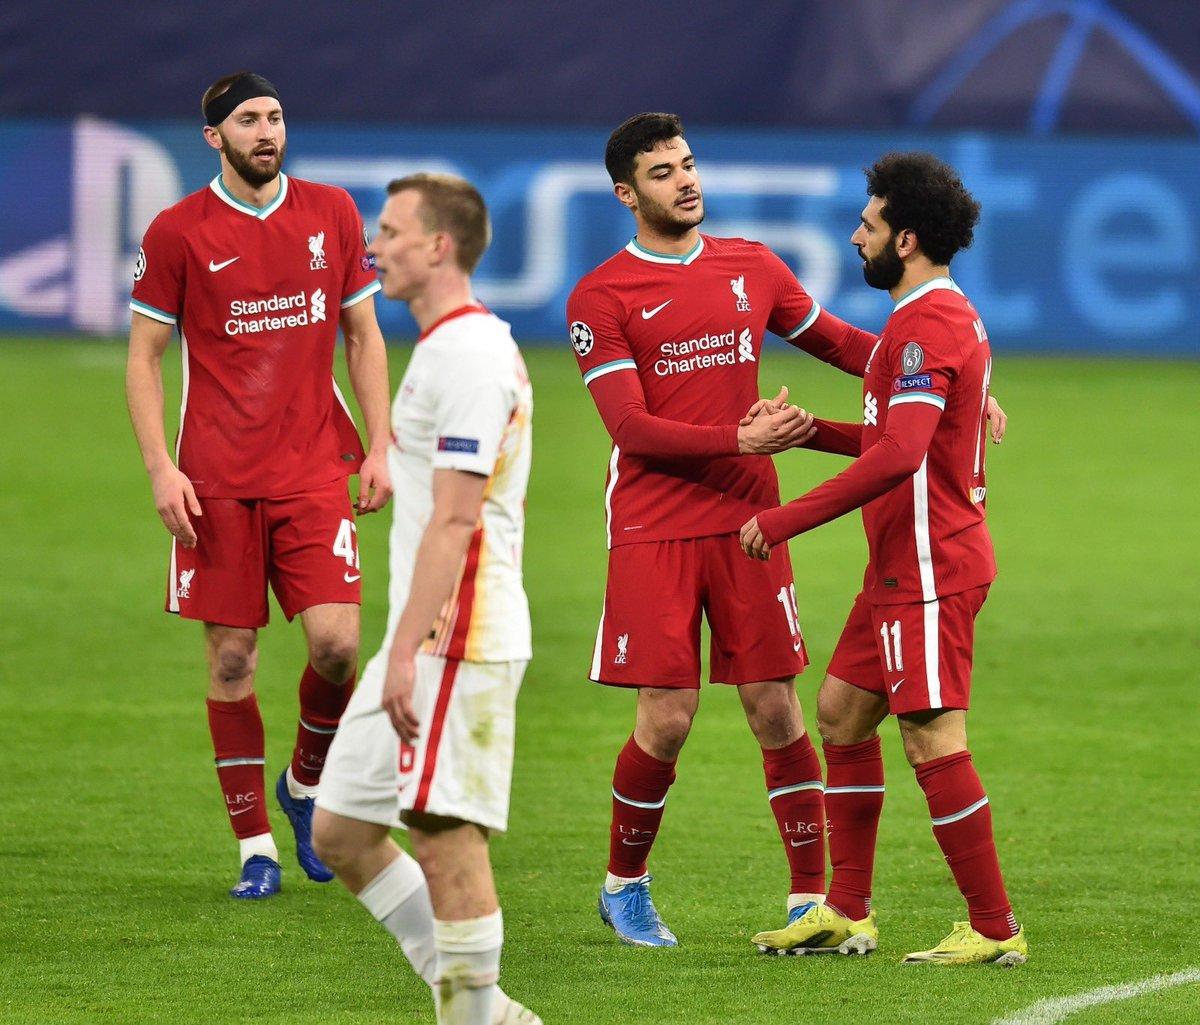 Mohamed Salah tan Ozan Kabak a övgü #2